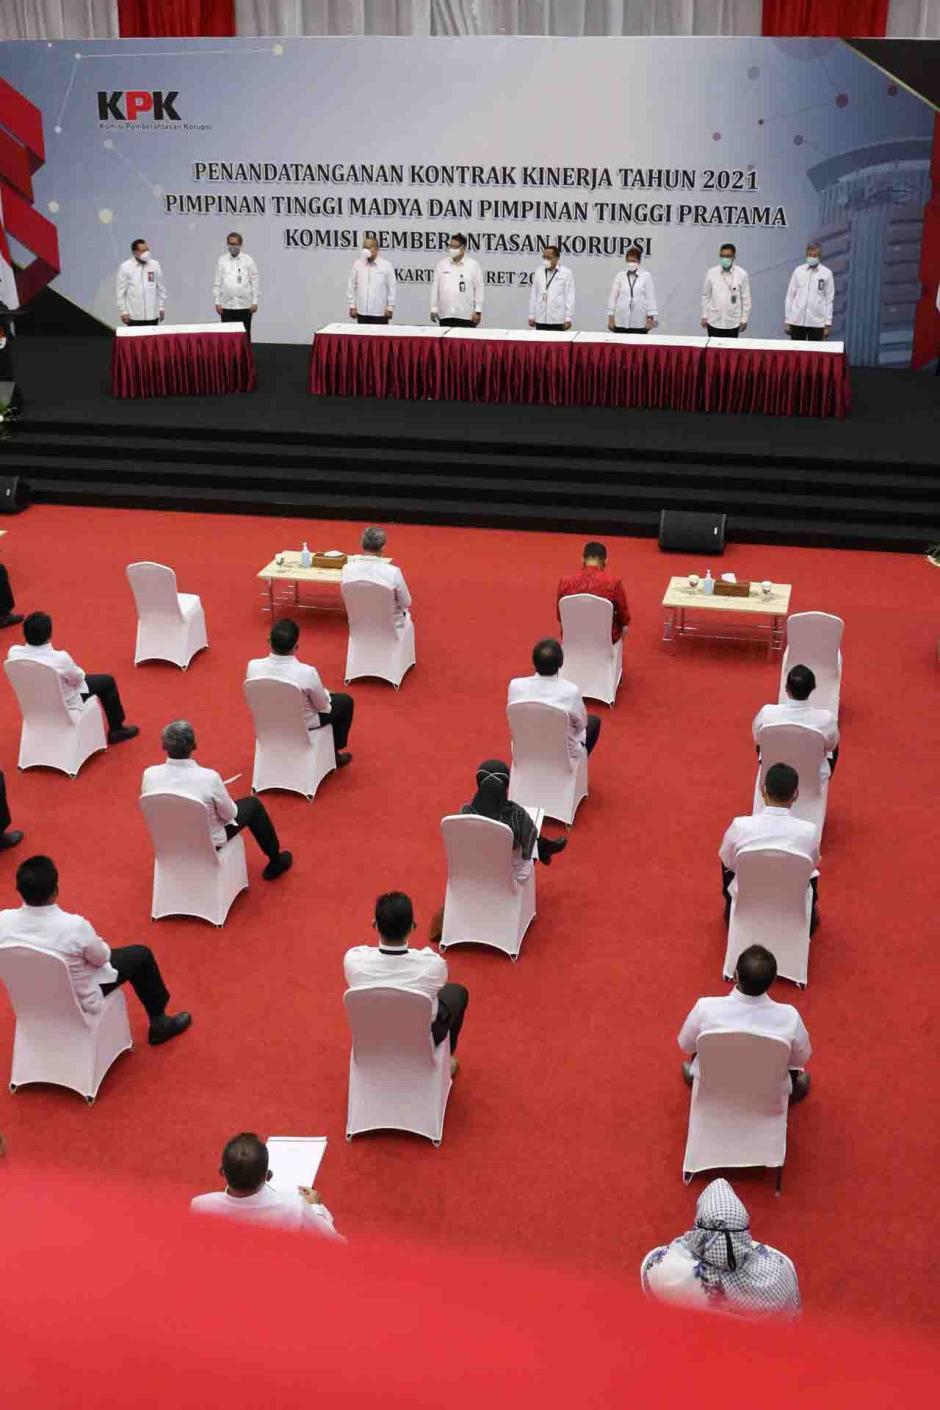 KPK Gelar Penandatanganan Kontrak Kinerja Pejabat Struktural-1